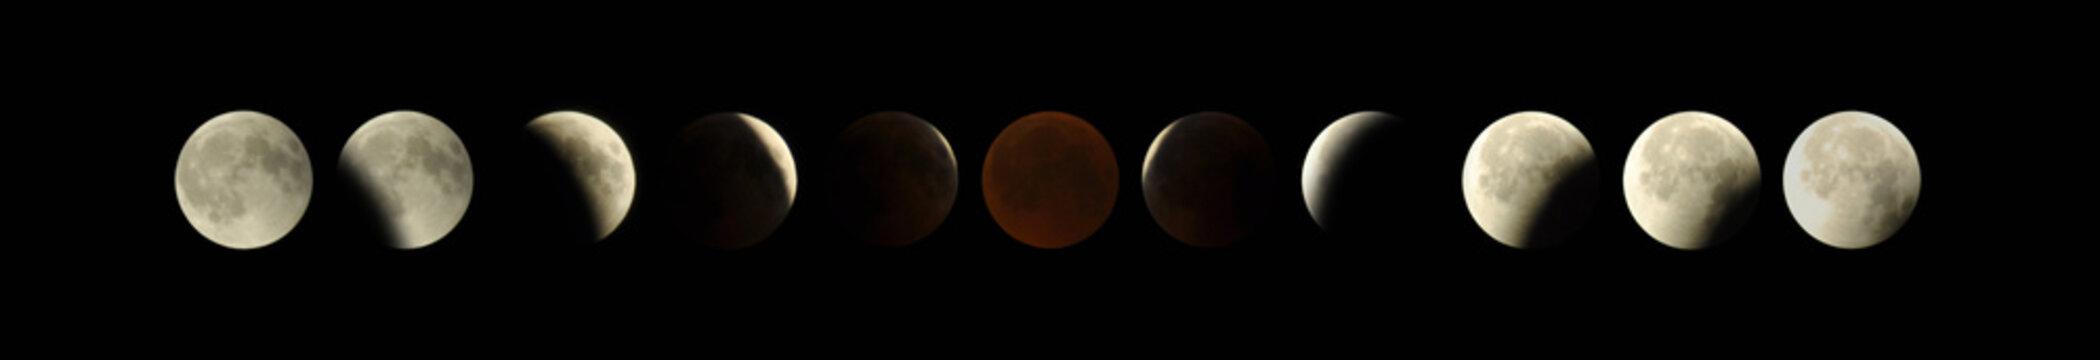 Moon Lunar Eclipse July 2018